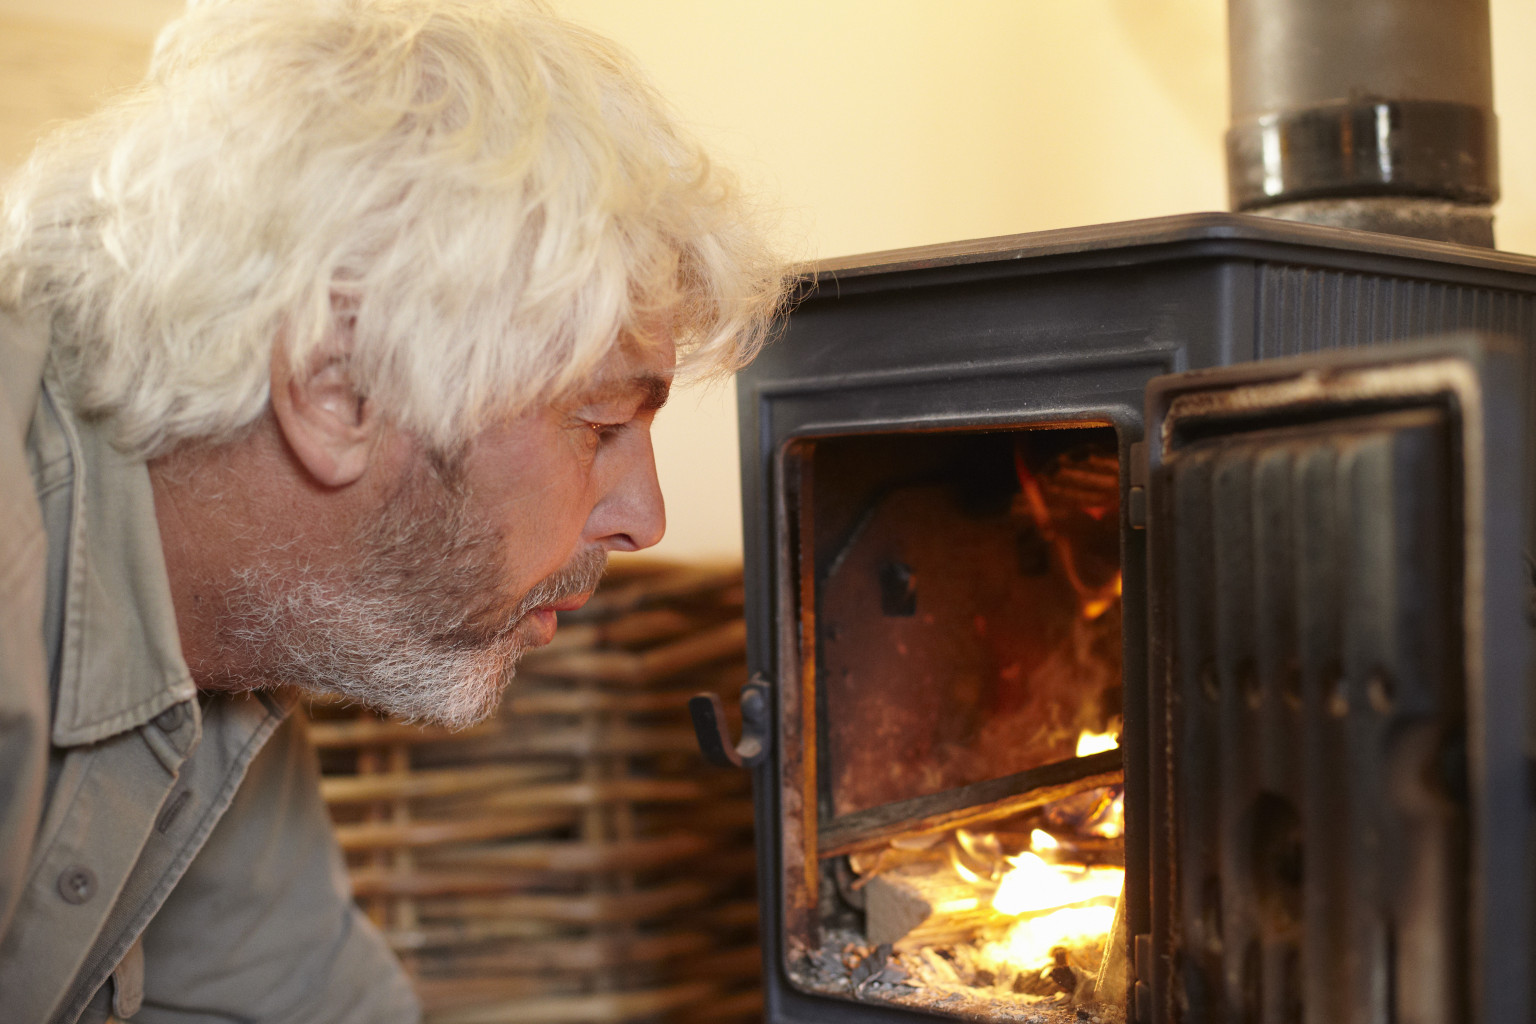 Convert Wood Burning To Gas Fireplace - Convert Wood Burning To Gas Fireplace ~ Pickapit.com